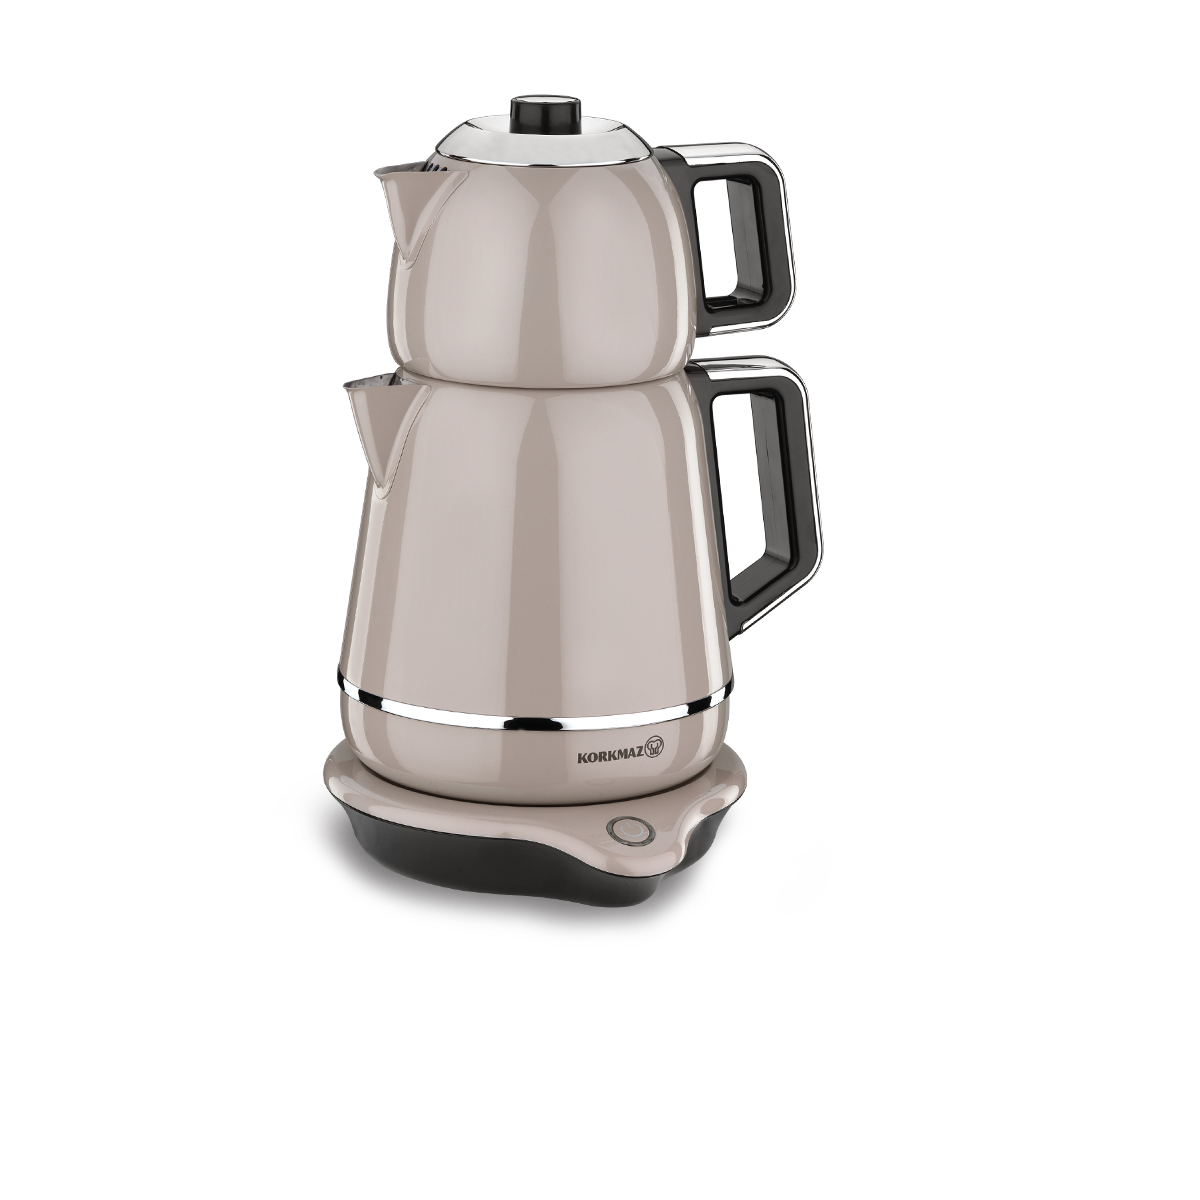 Korkmaz Demiks Bej/Krom Elektrikli Çaydanlık